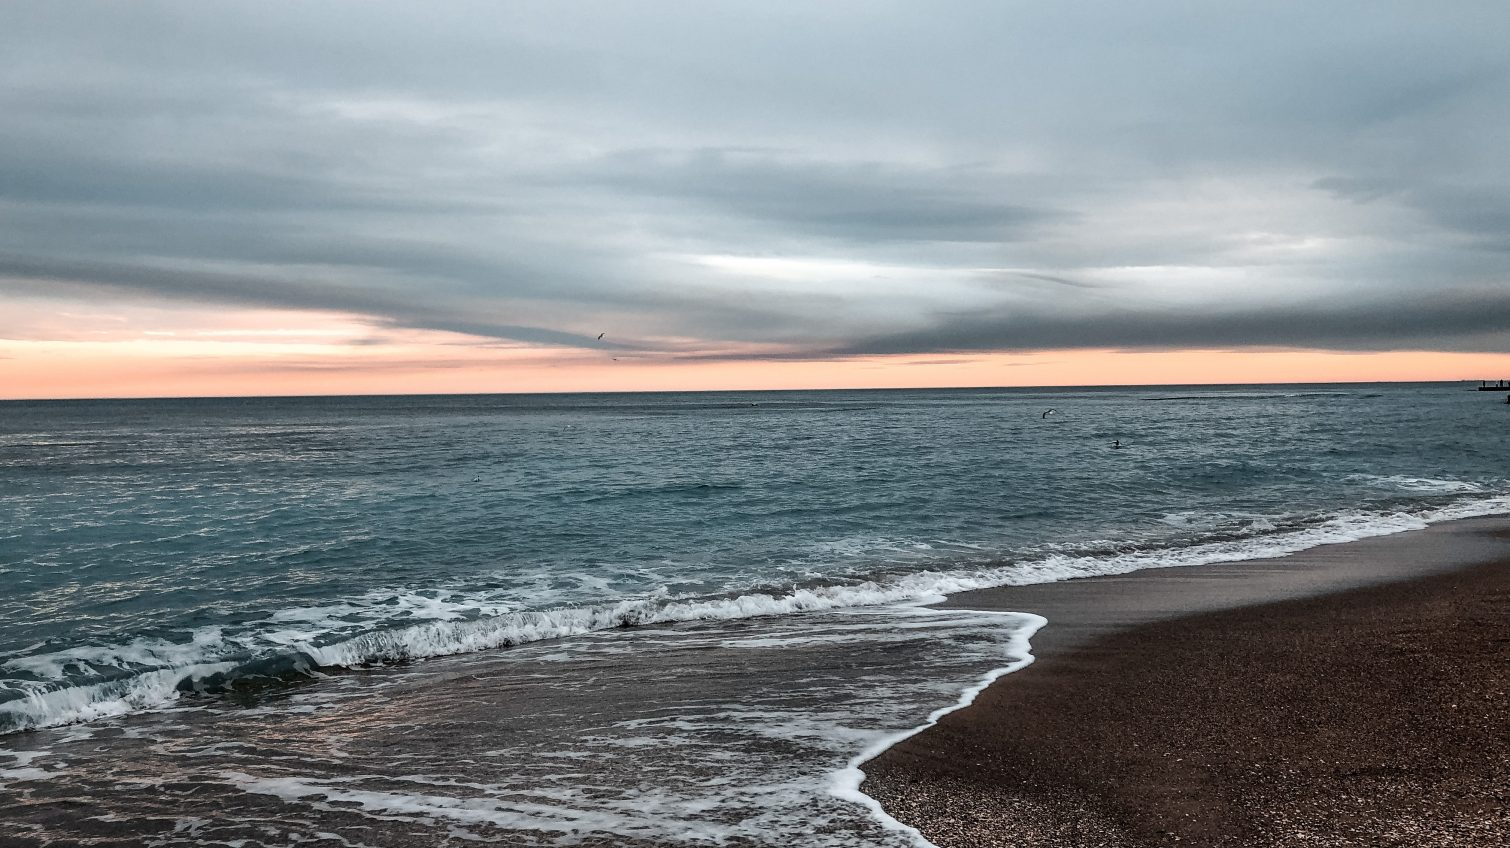 Во вторник в Одессе будет дождливо и ветрено «фото»